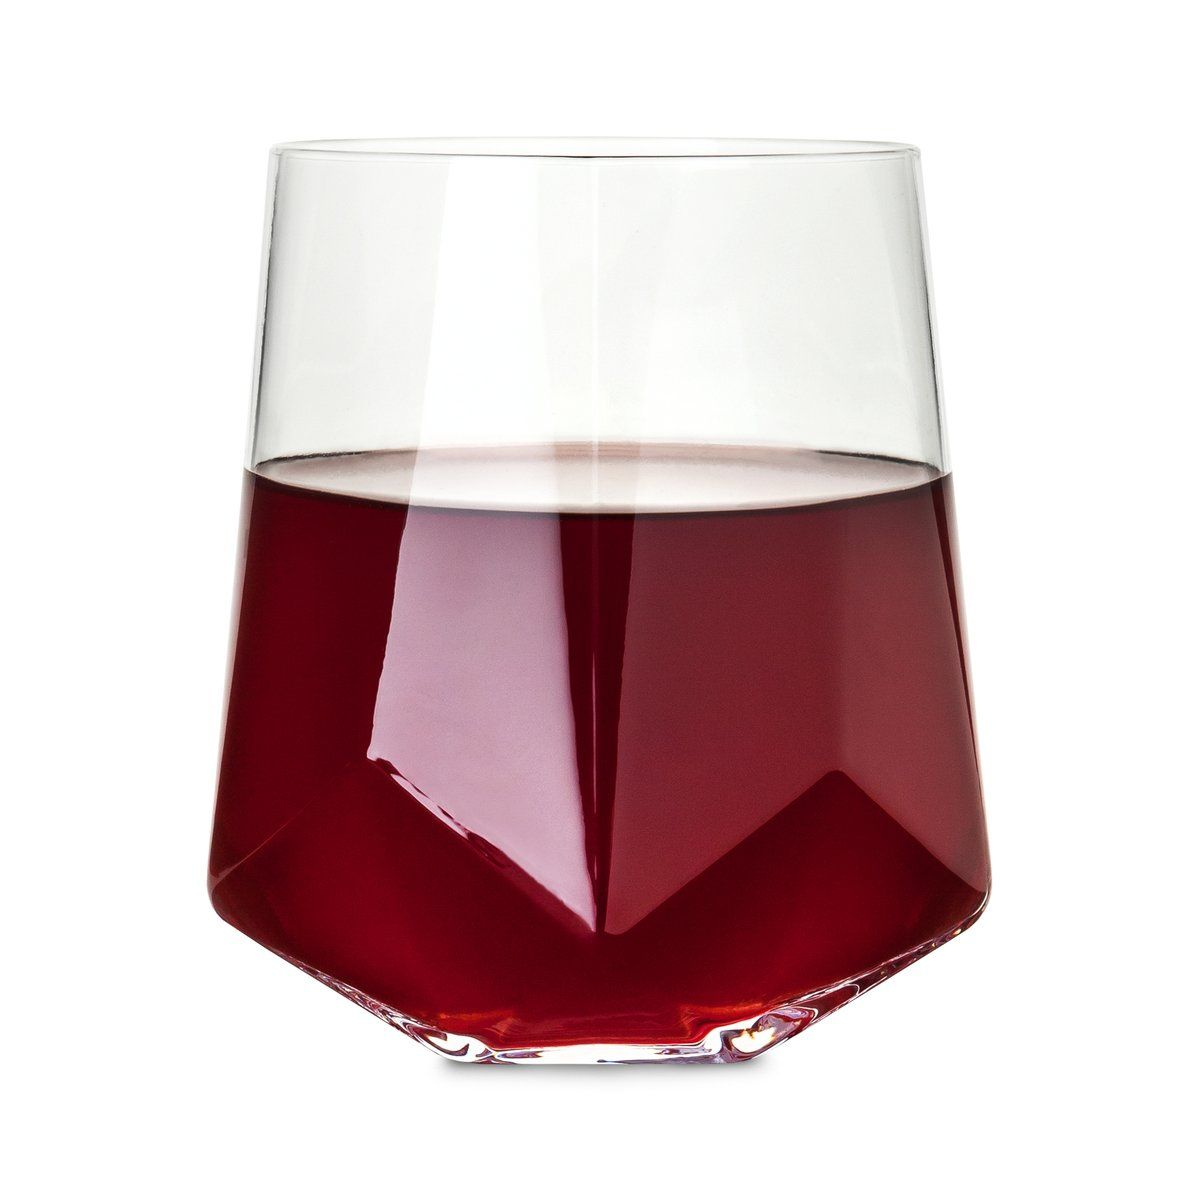 Faceted Crystal Wine Glasses By Viski In 2020 Crystal Wine Glasses Wine Glass Set Wine Glass